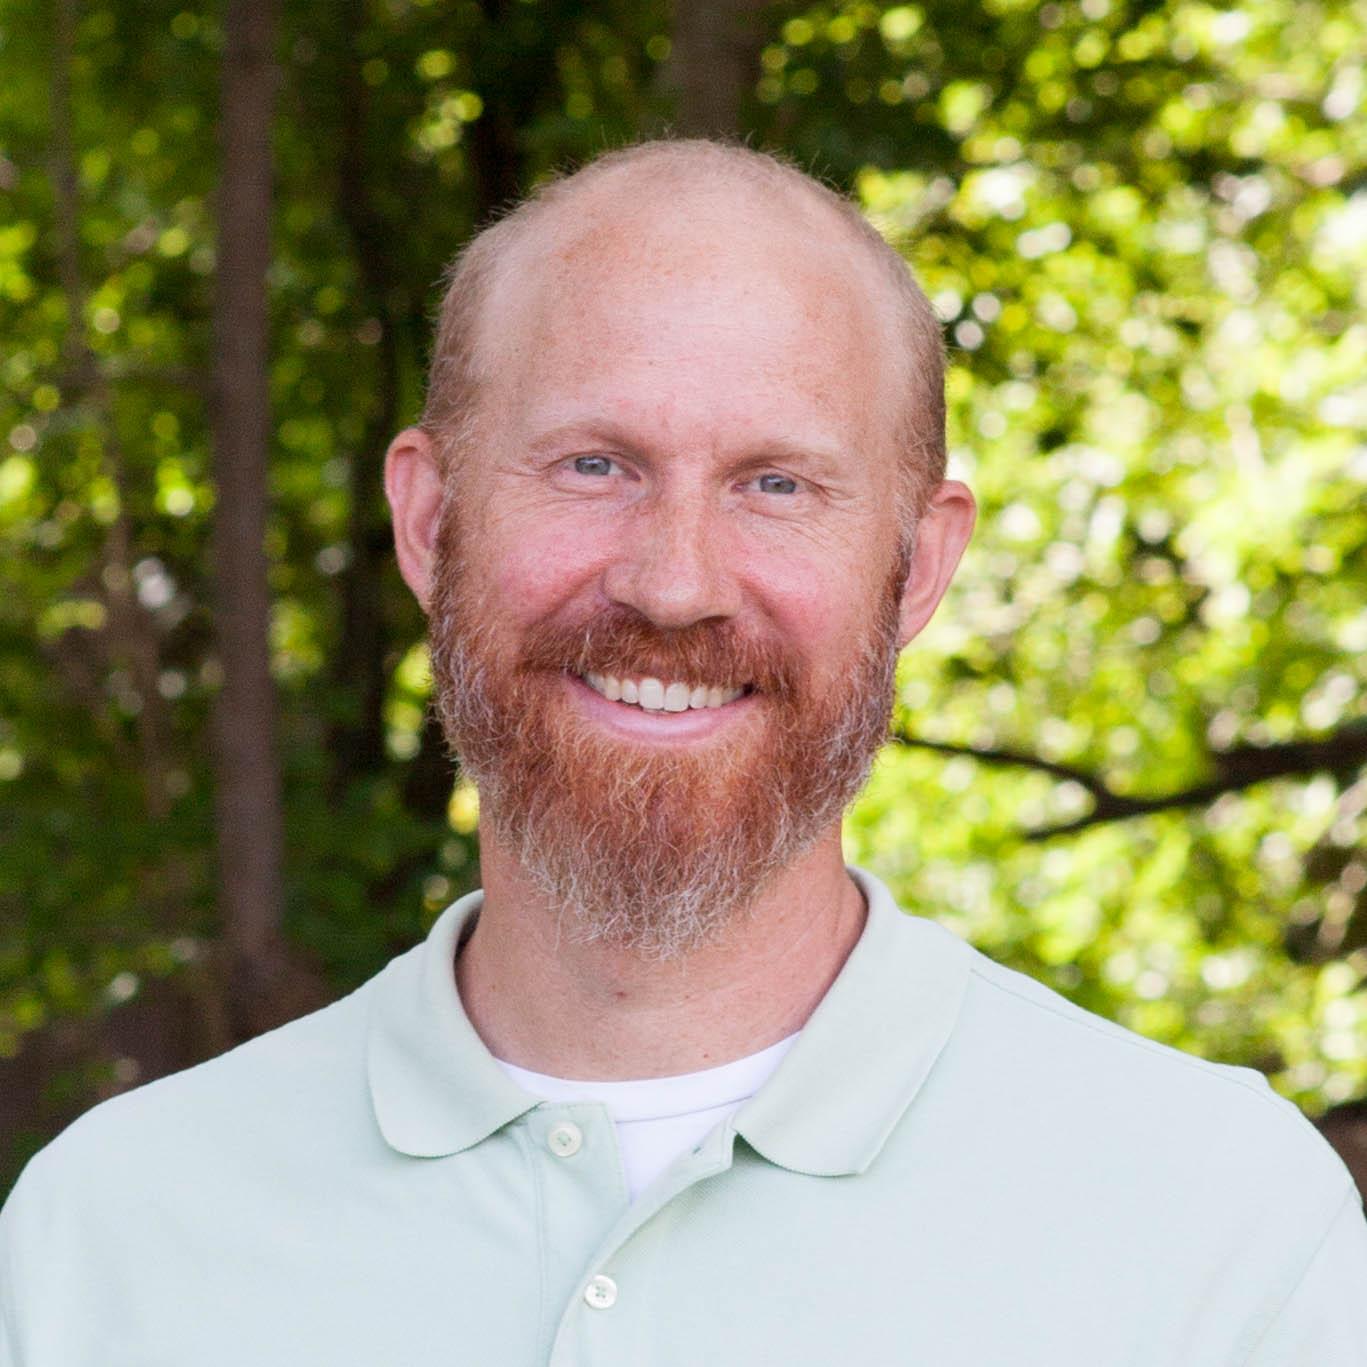 Kirk Craig  Co-Founder and   Executive Director  kirk@agapedevelopment.org